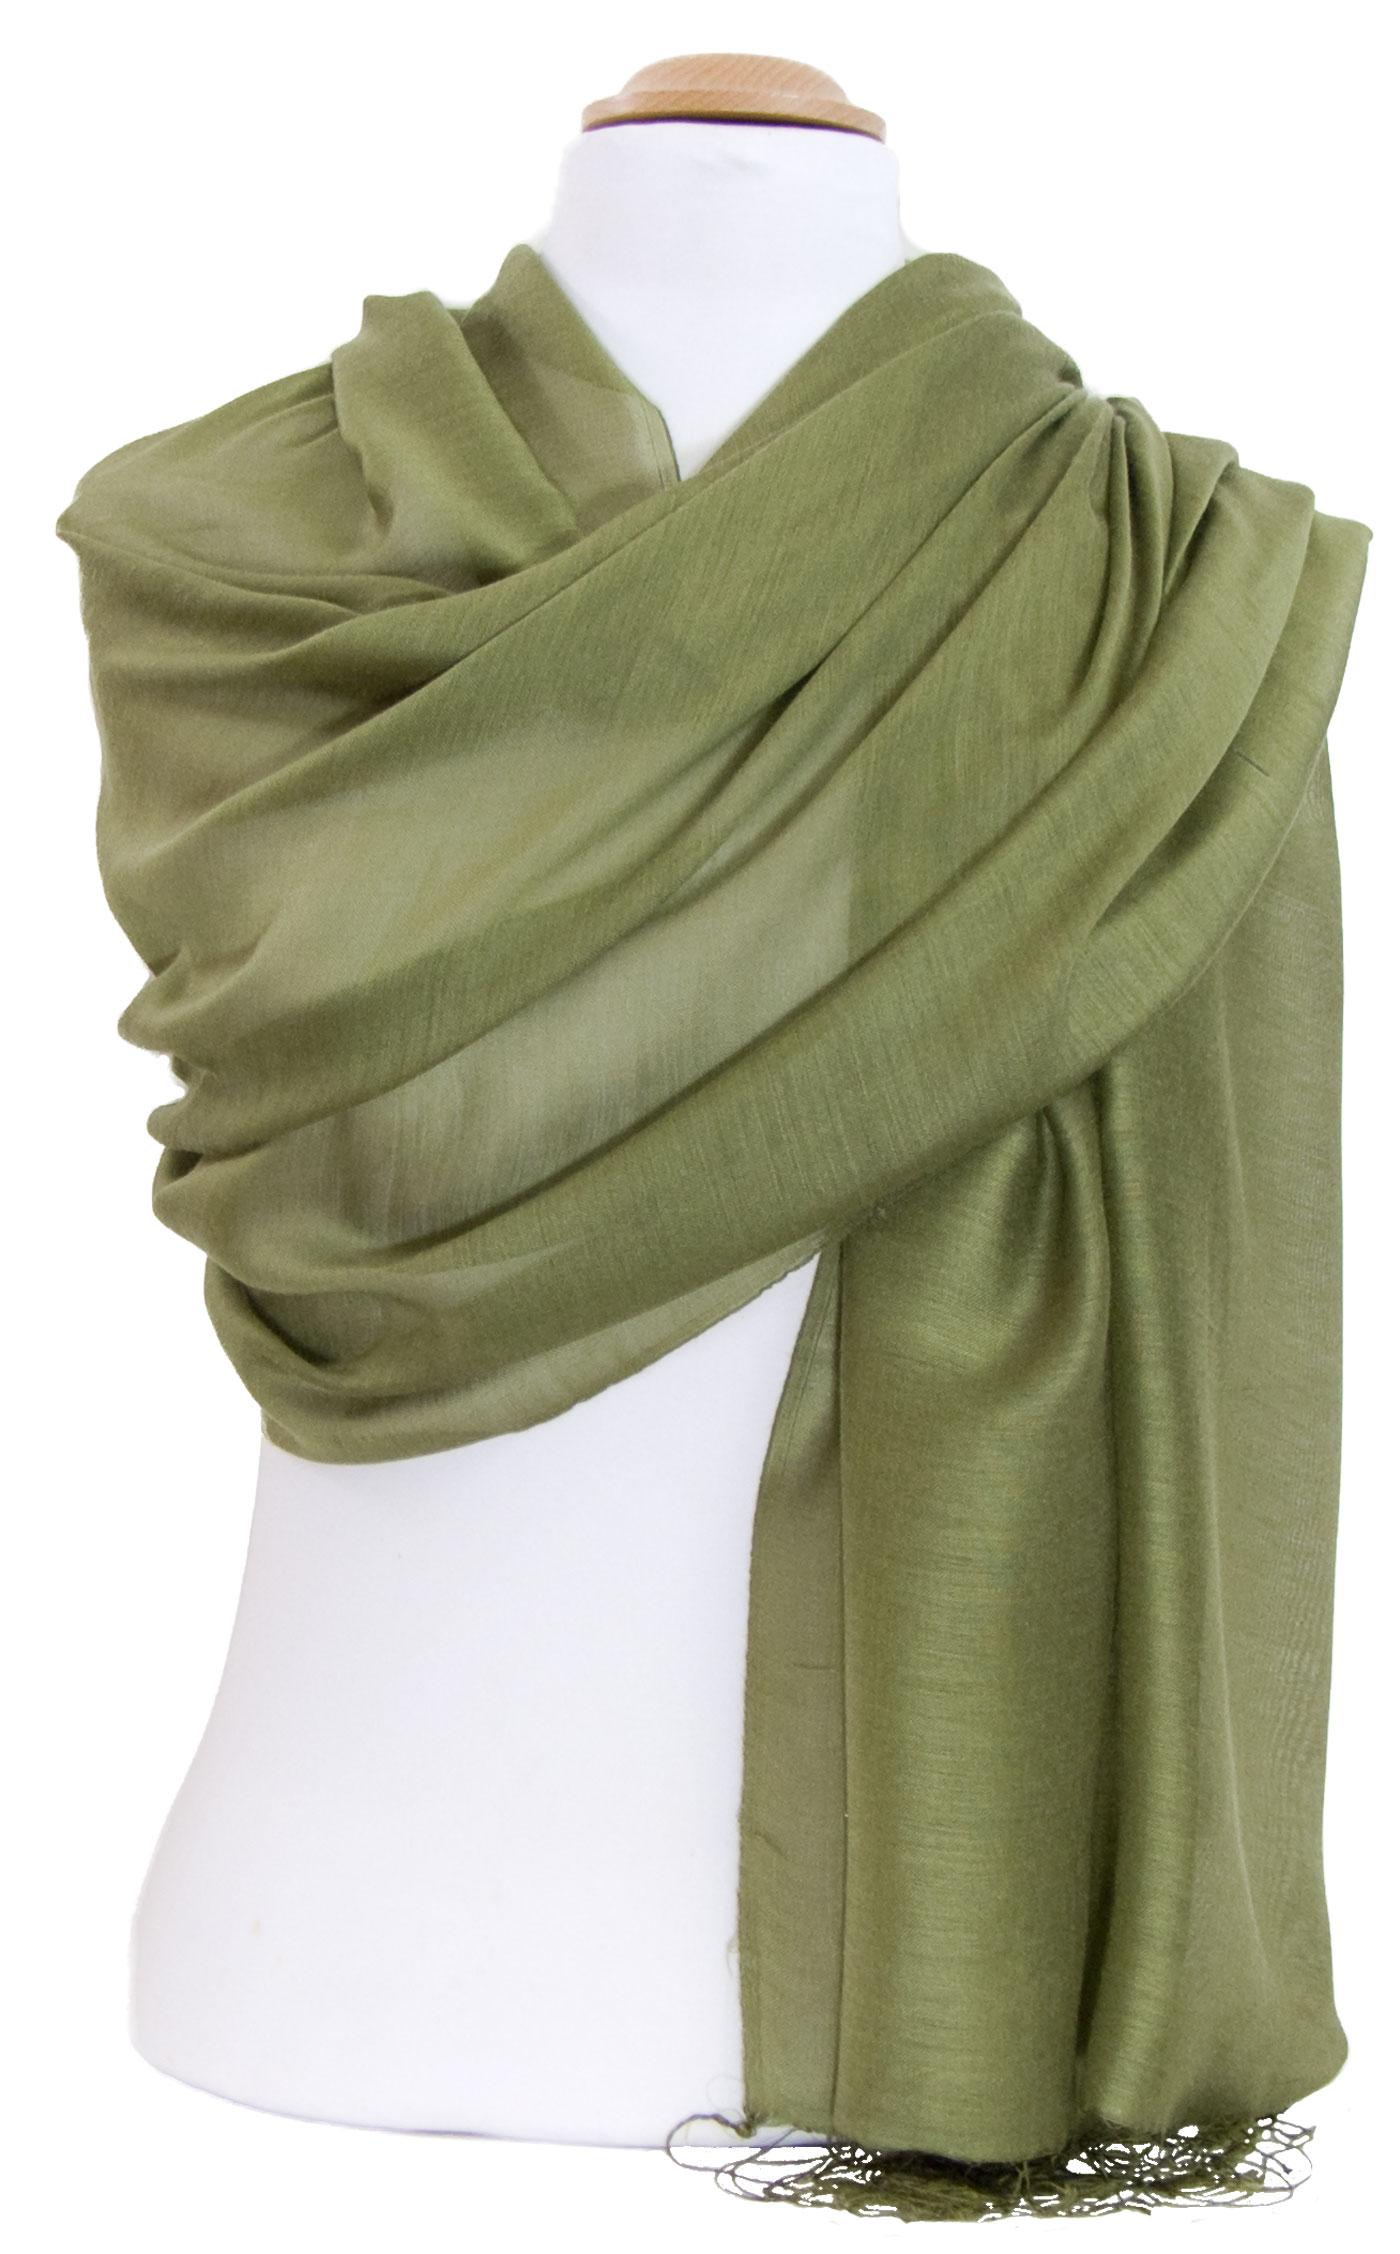 Etole foulard vert kaki soie viscose Alex